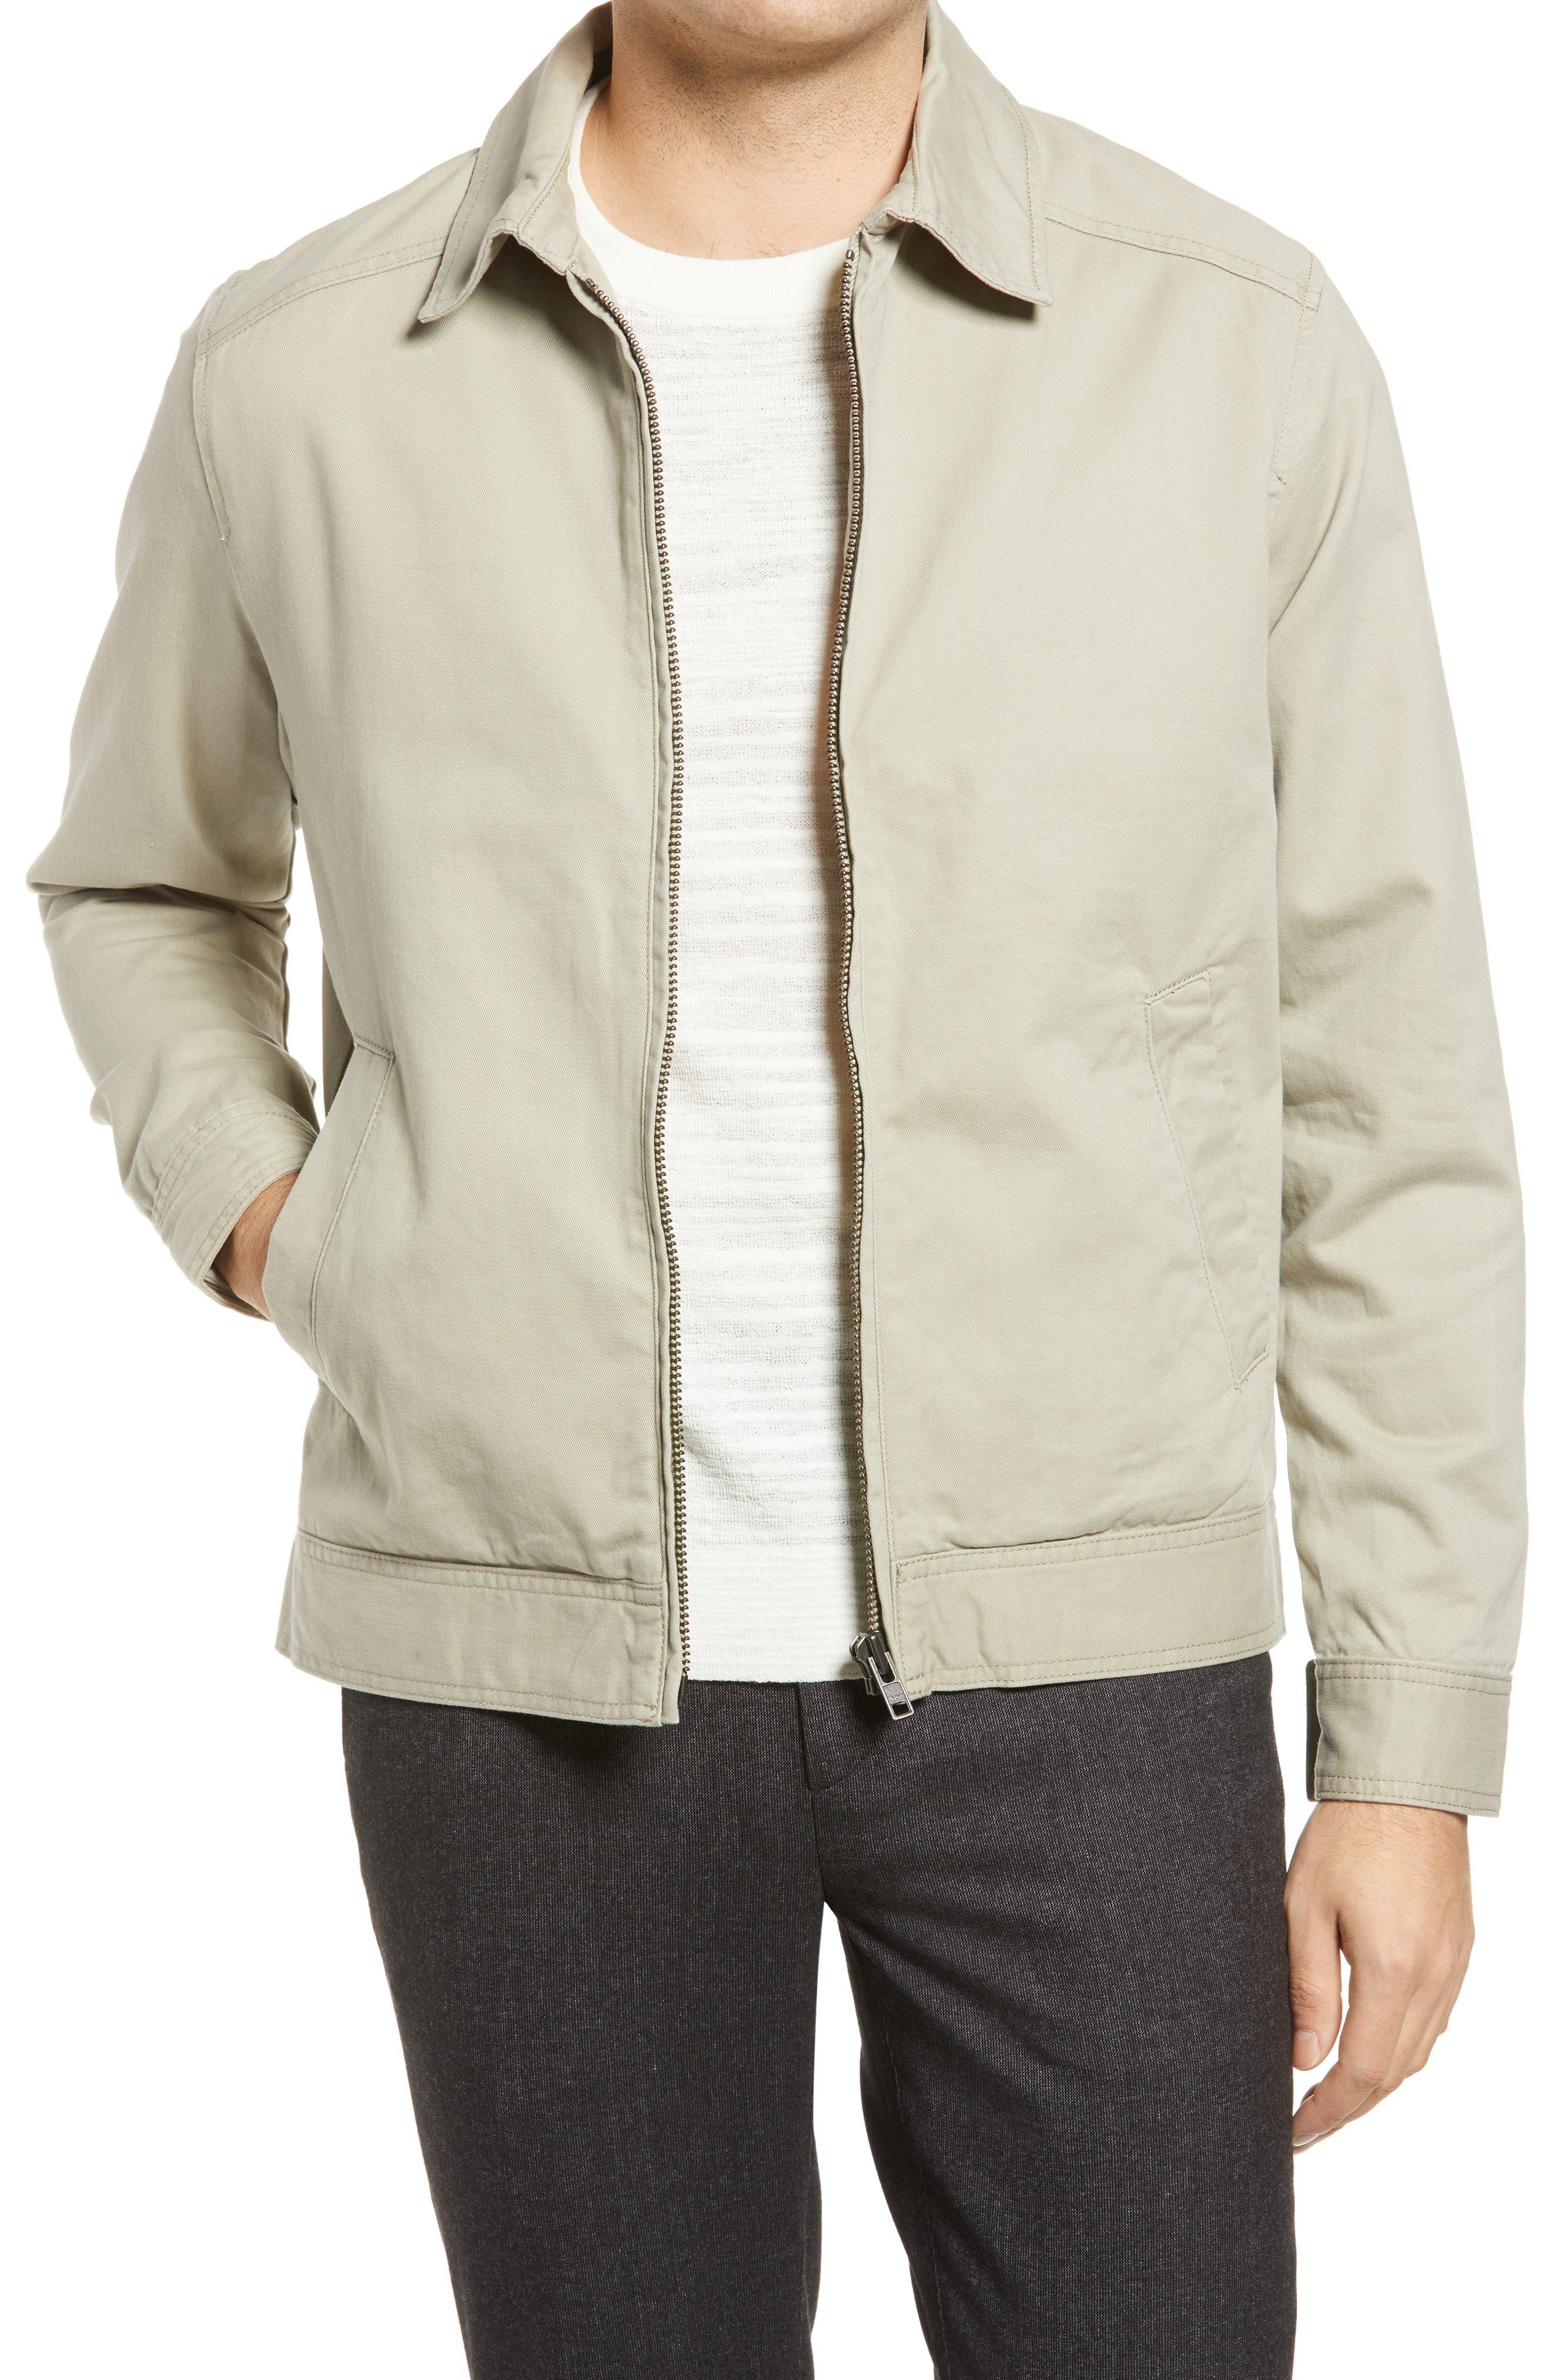 50s Men's Jackets | Greaser Jackets, Leather, Bomber, Gabardine Mens Rodd  Hunn Mount Aspiring Cotton Jacket Size Small - Grey $99.50 AT vintagedancer.com